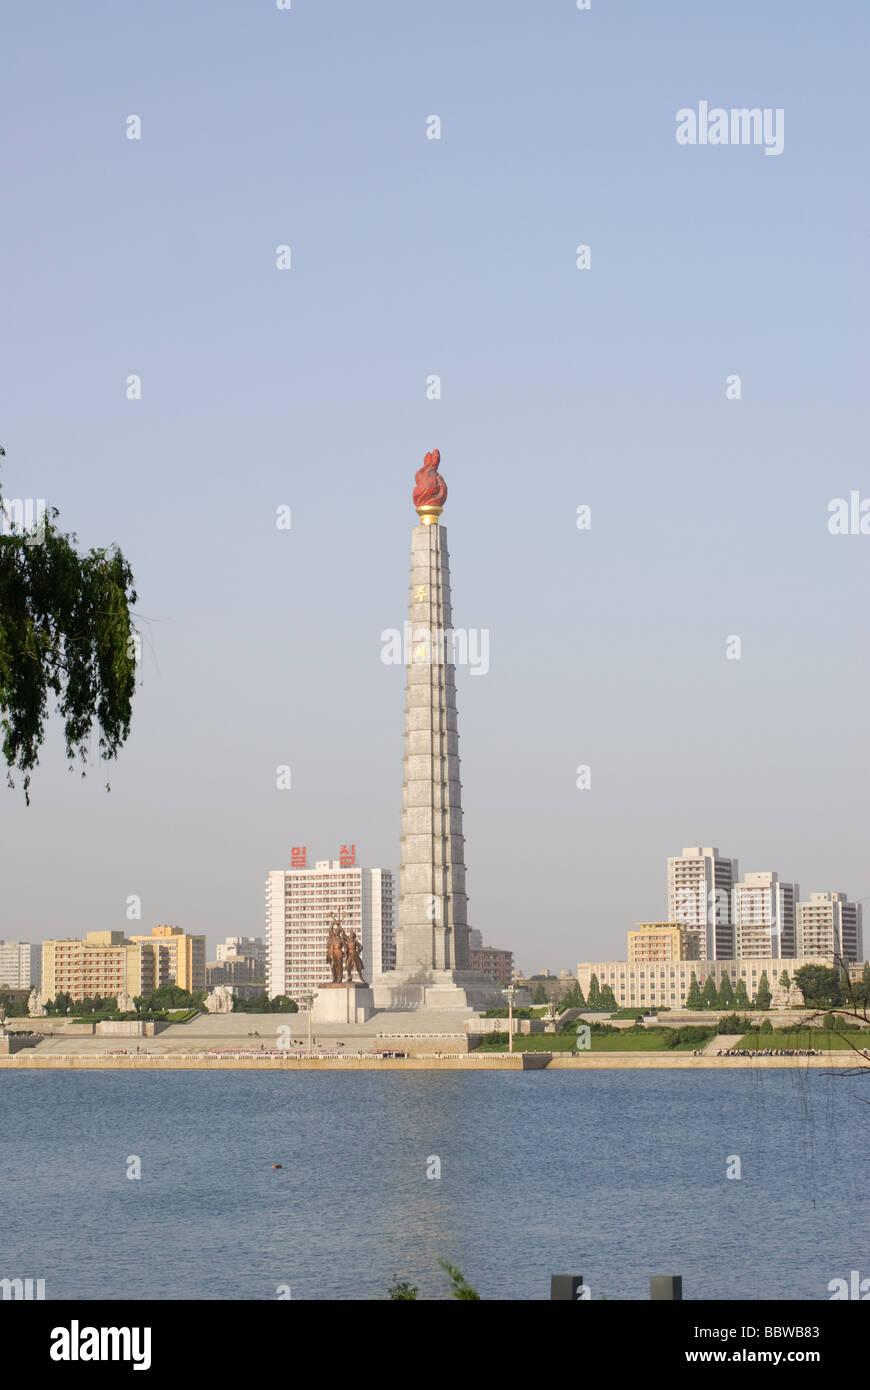 tower of Juche Idea in Pyongyang North Korea - Stock Image